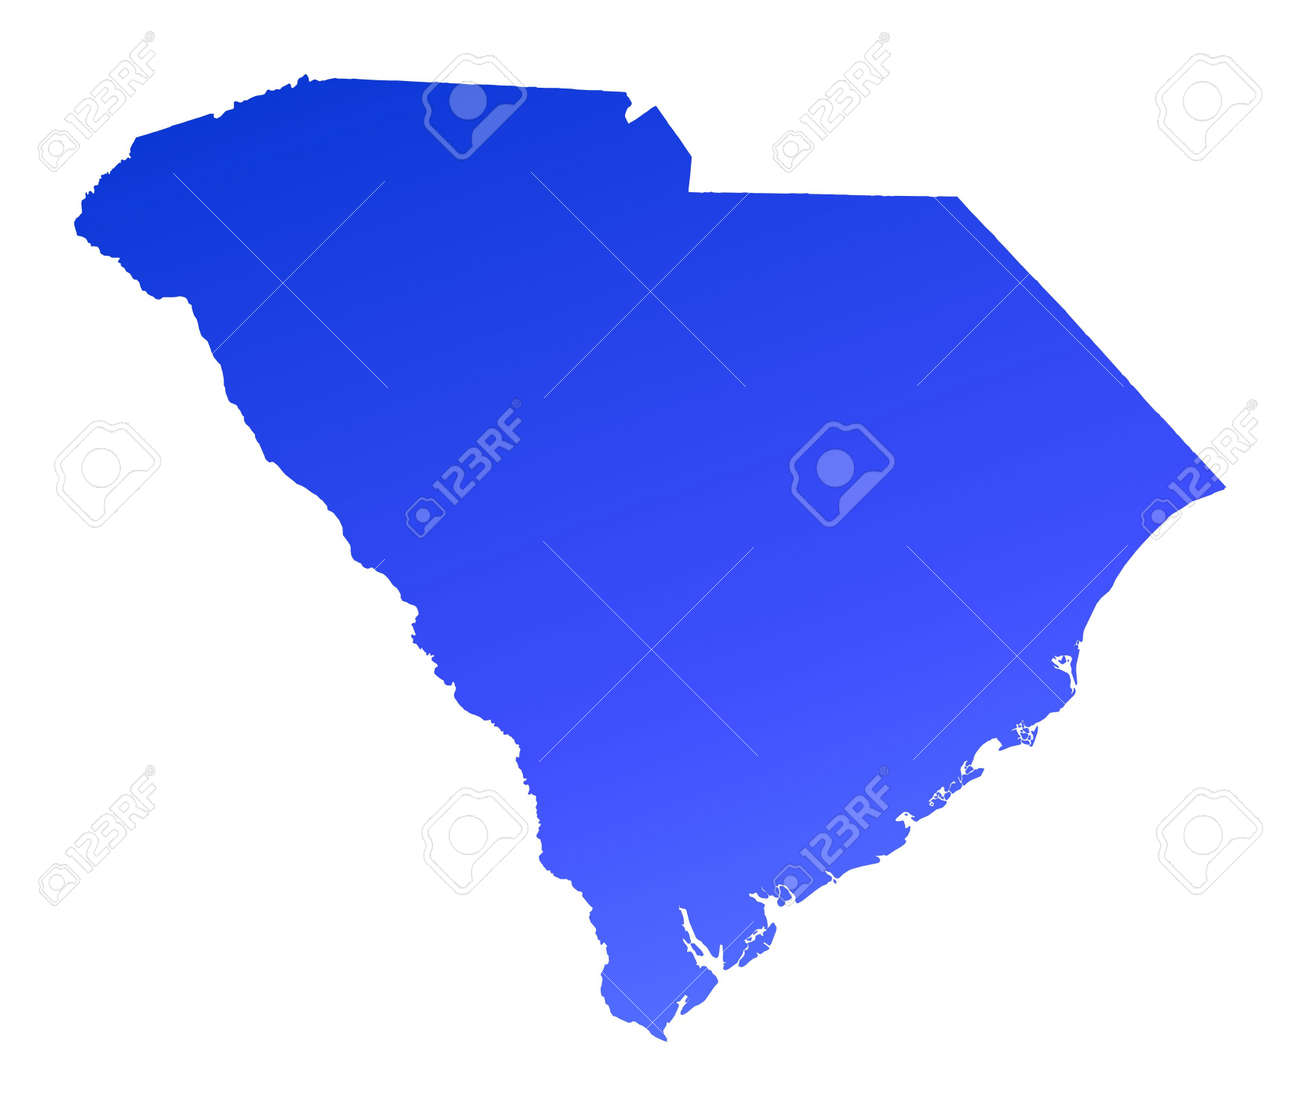 Reference Map Of South Carolina USA Nations Online Project - Map of usa showing south carolina